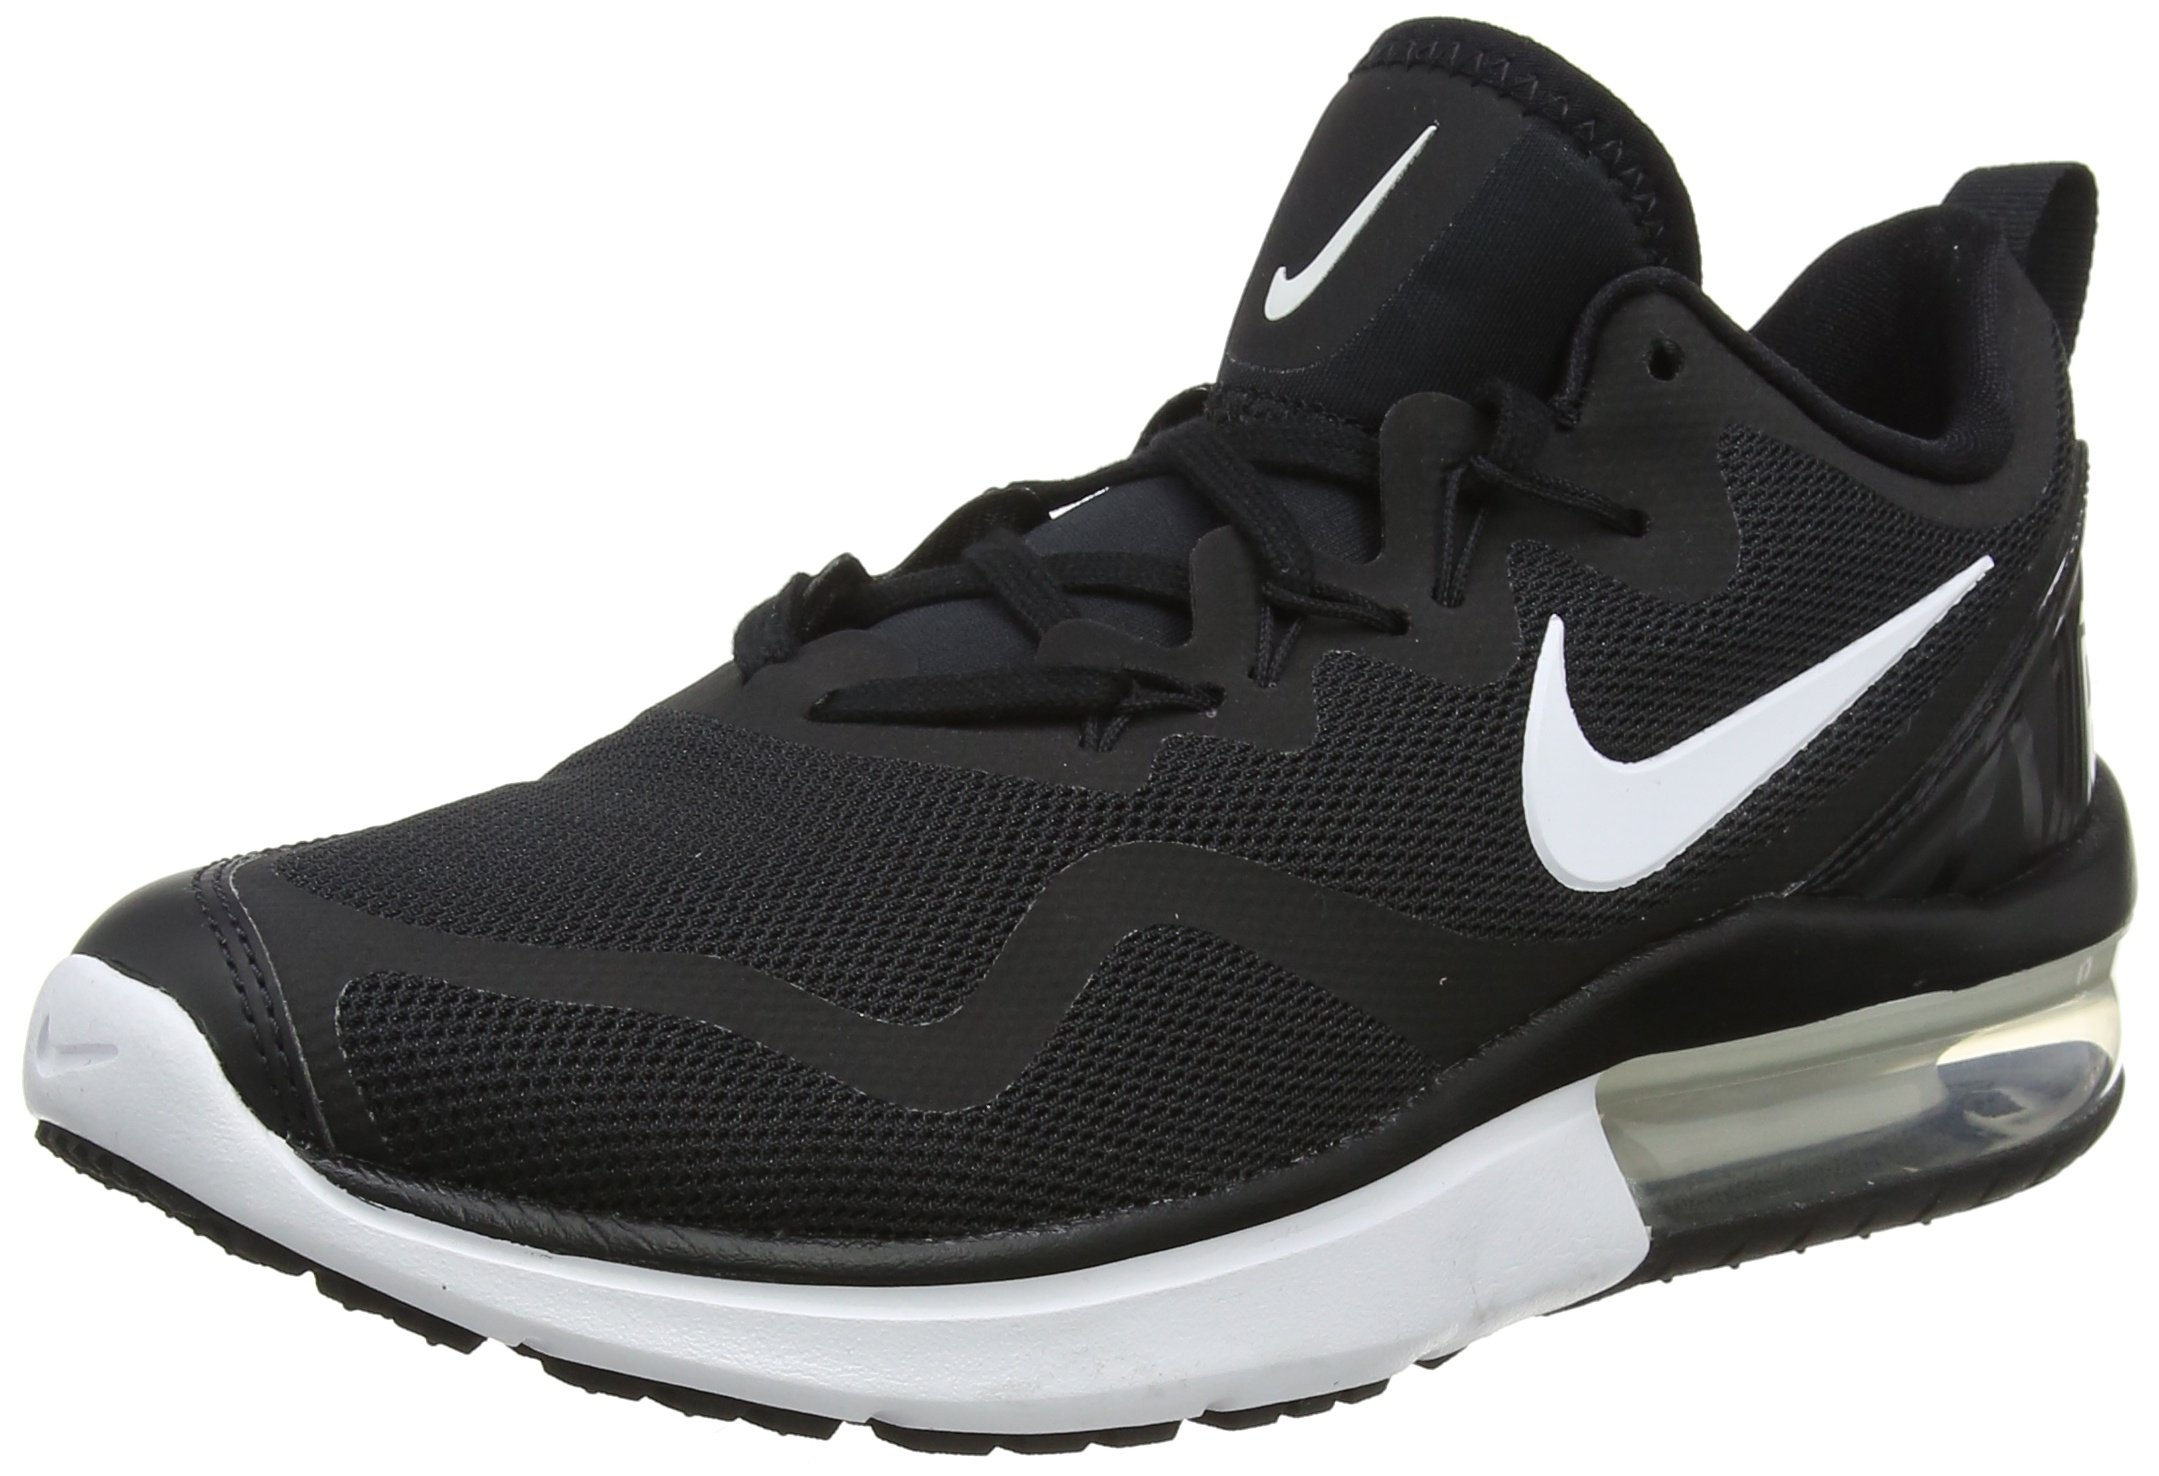 7cfbaf4db10 Galleon - NIKE AIR MAX Fury Mens Road Running Shoes AA5739-001 Size 7.5  D(M) US